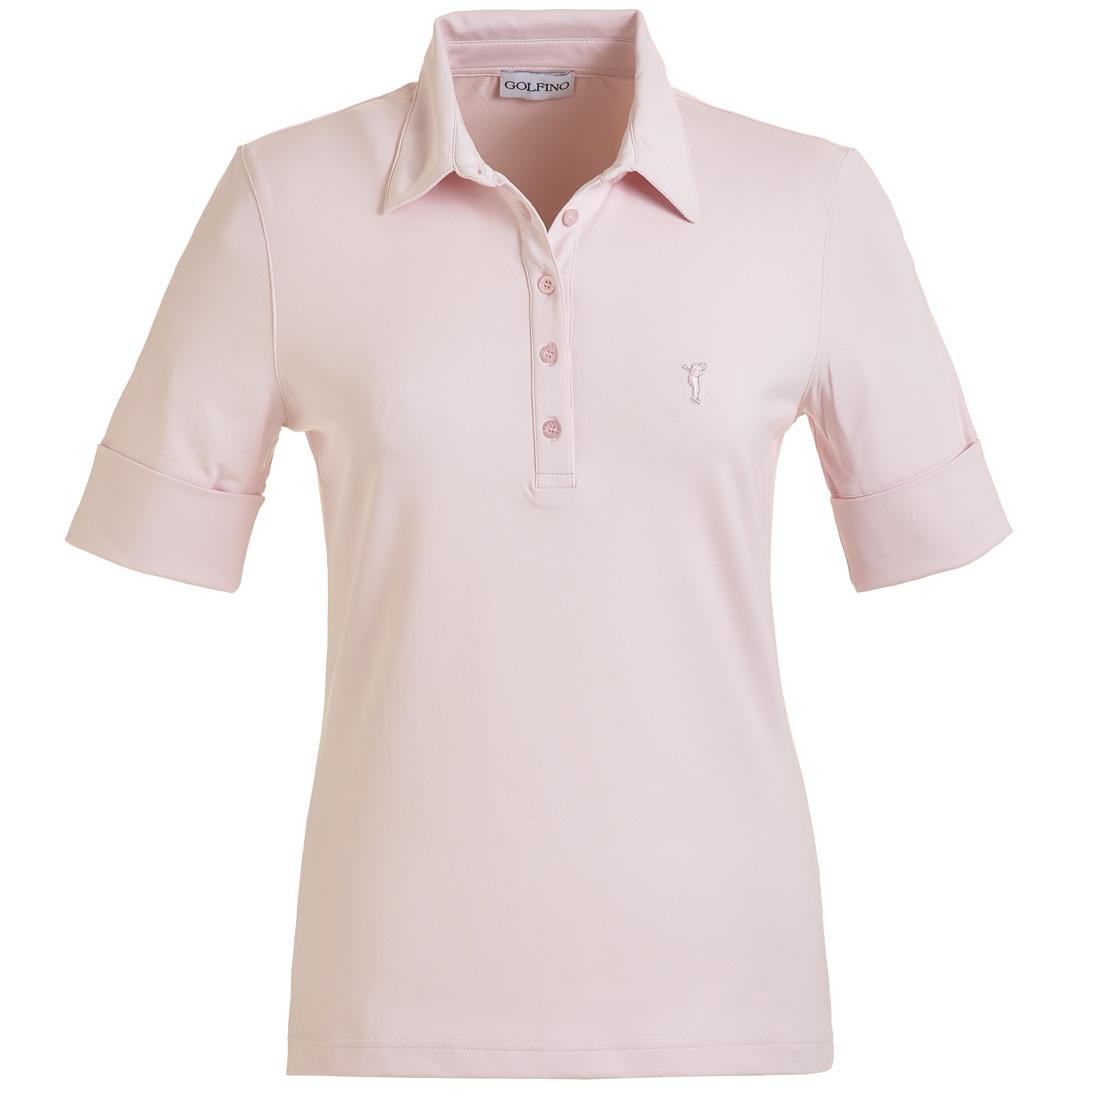 Dry Comfort Jersey Poloshirt mit gekrempelten Ärmeln